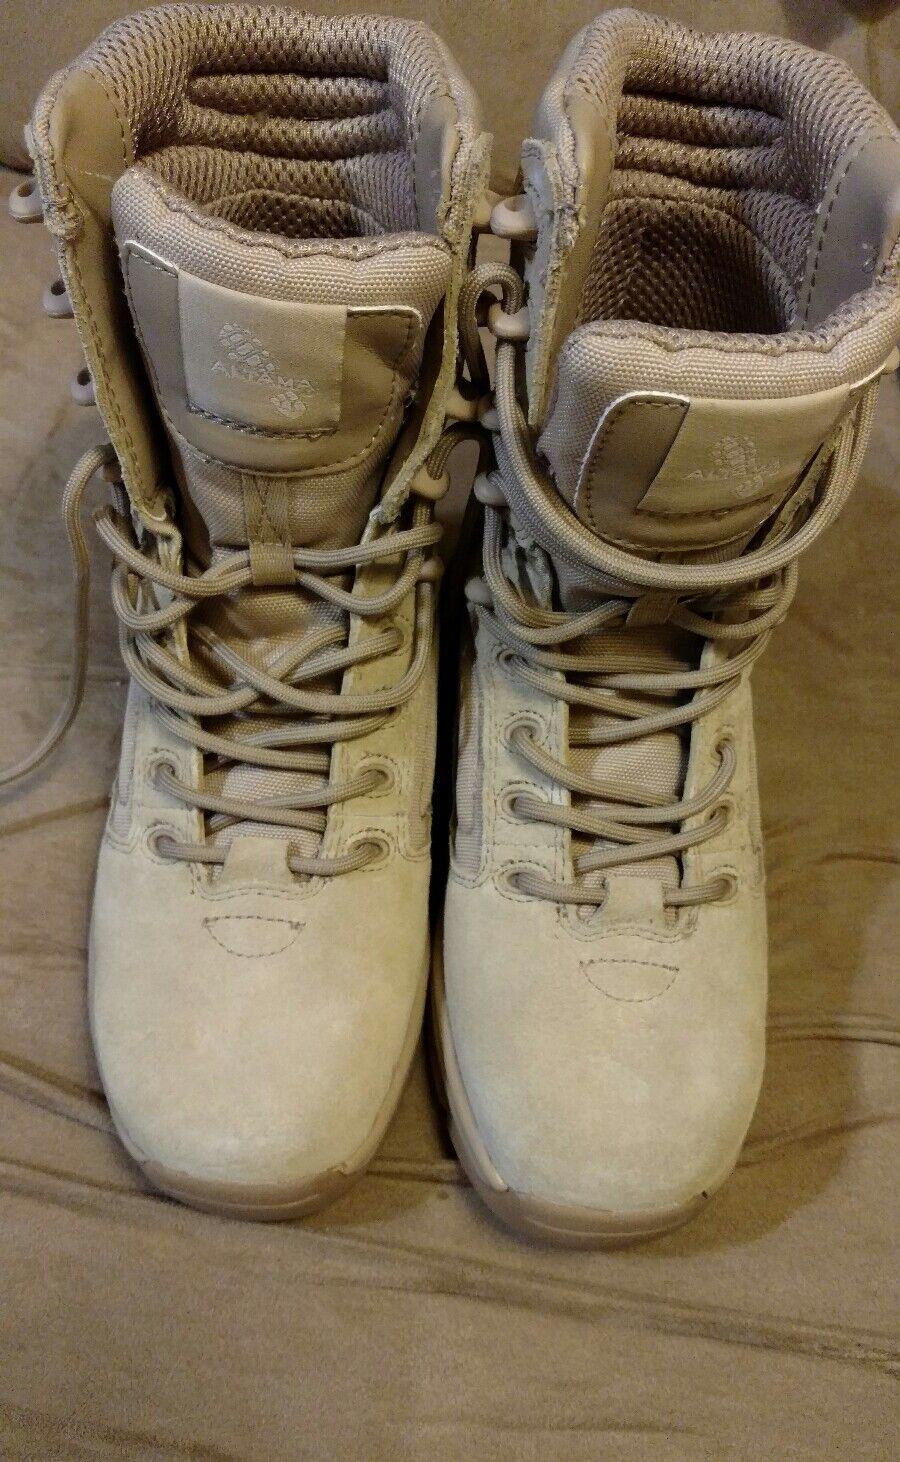 Altma Exospeed 2 para mujer Talla 4.5 policía militar Desert Workbotas tan Desert militar 9b9e32